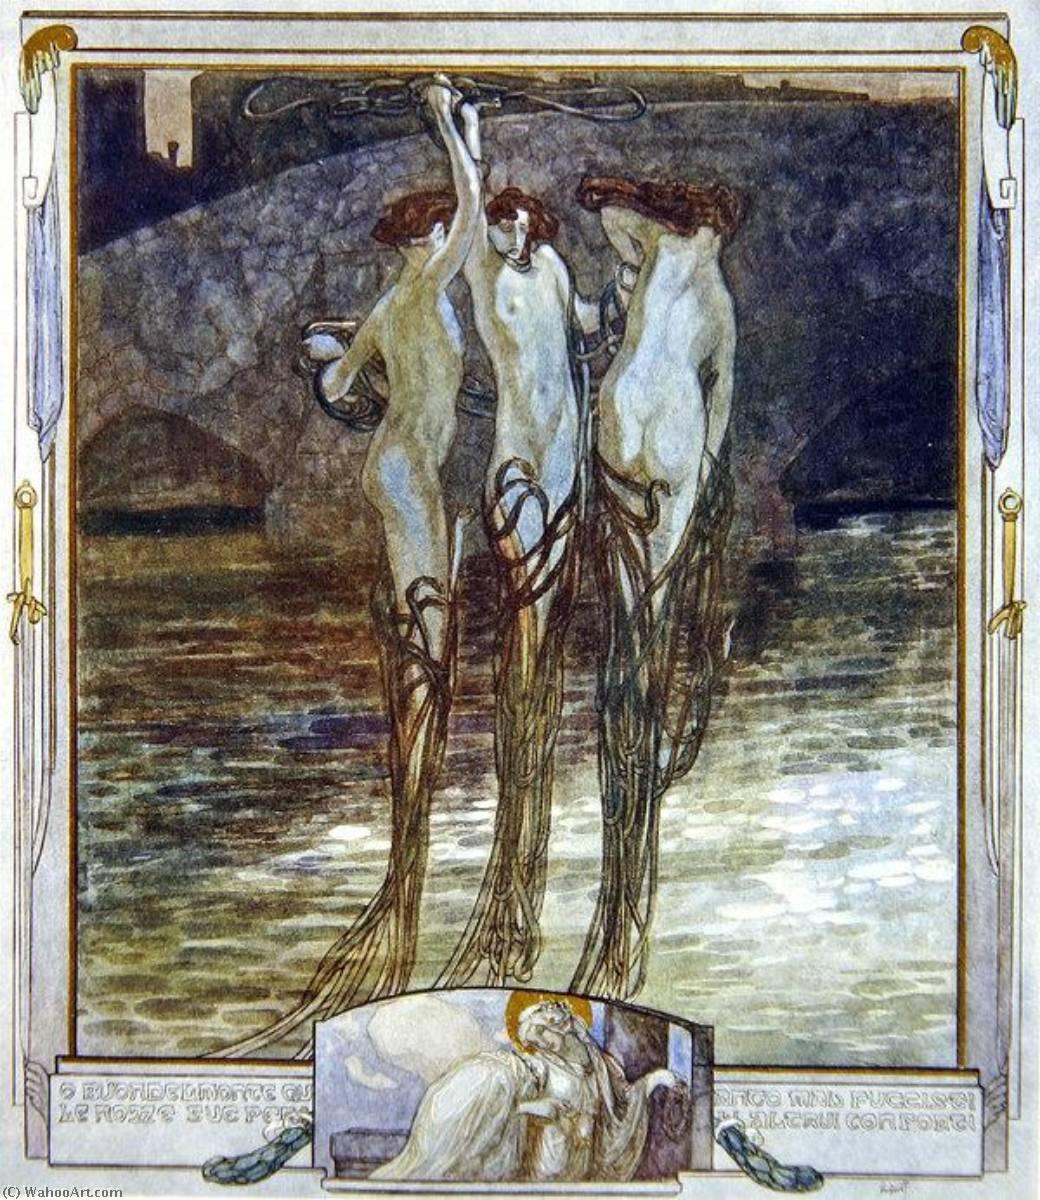 WikiOO.org – 美術百科全書 - 繪畫,作品 Franz Von Bayros - 插图 从 Dante's 'Divine Comedy' , 天堂 , 第十六坎托